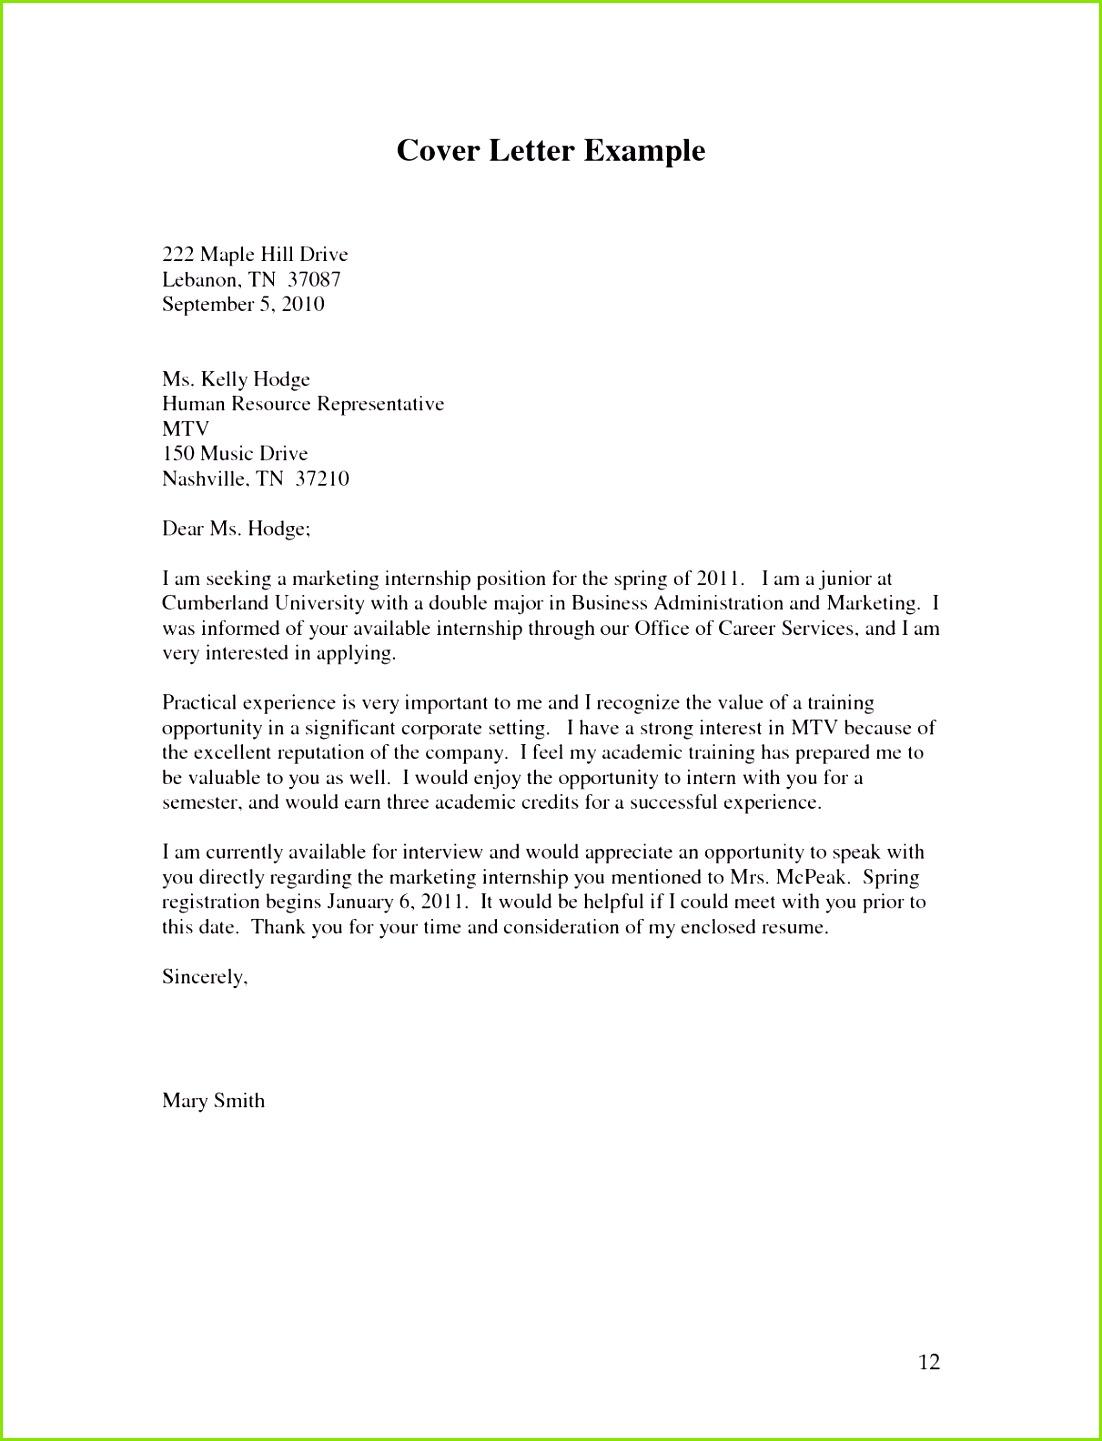 Briefing Marketing Vorlage Einzigartig Cover Letter Examples for Internship Beautiful Job Letter 0d Designuaukyu gzj